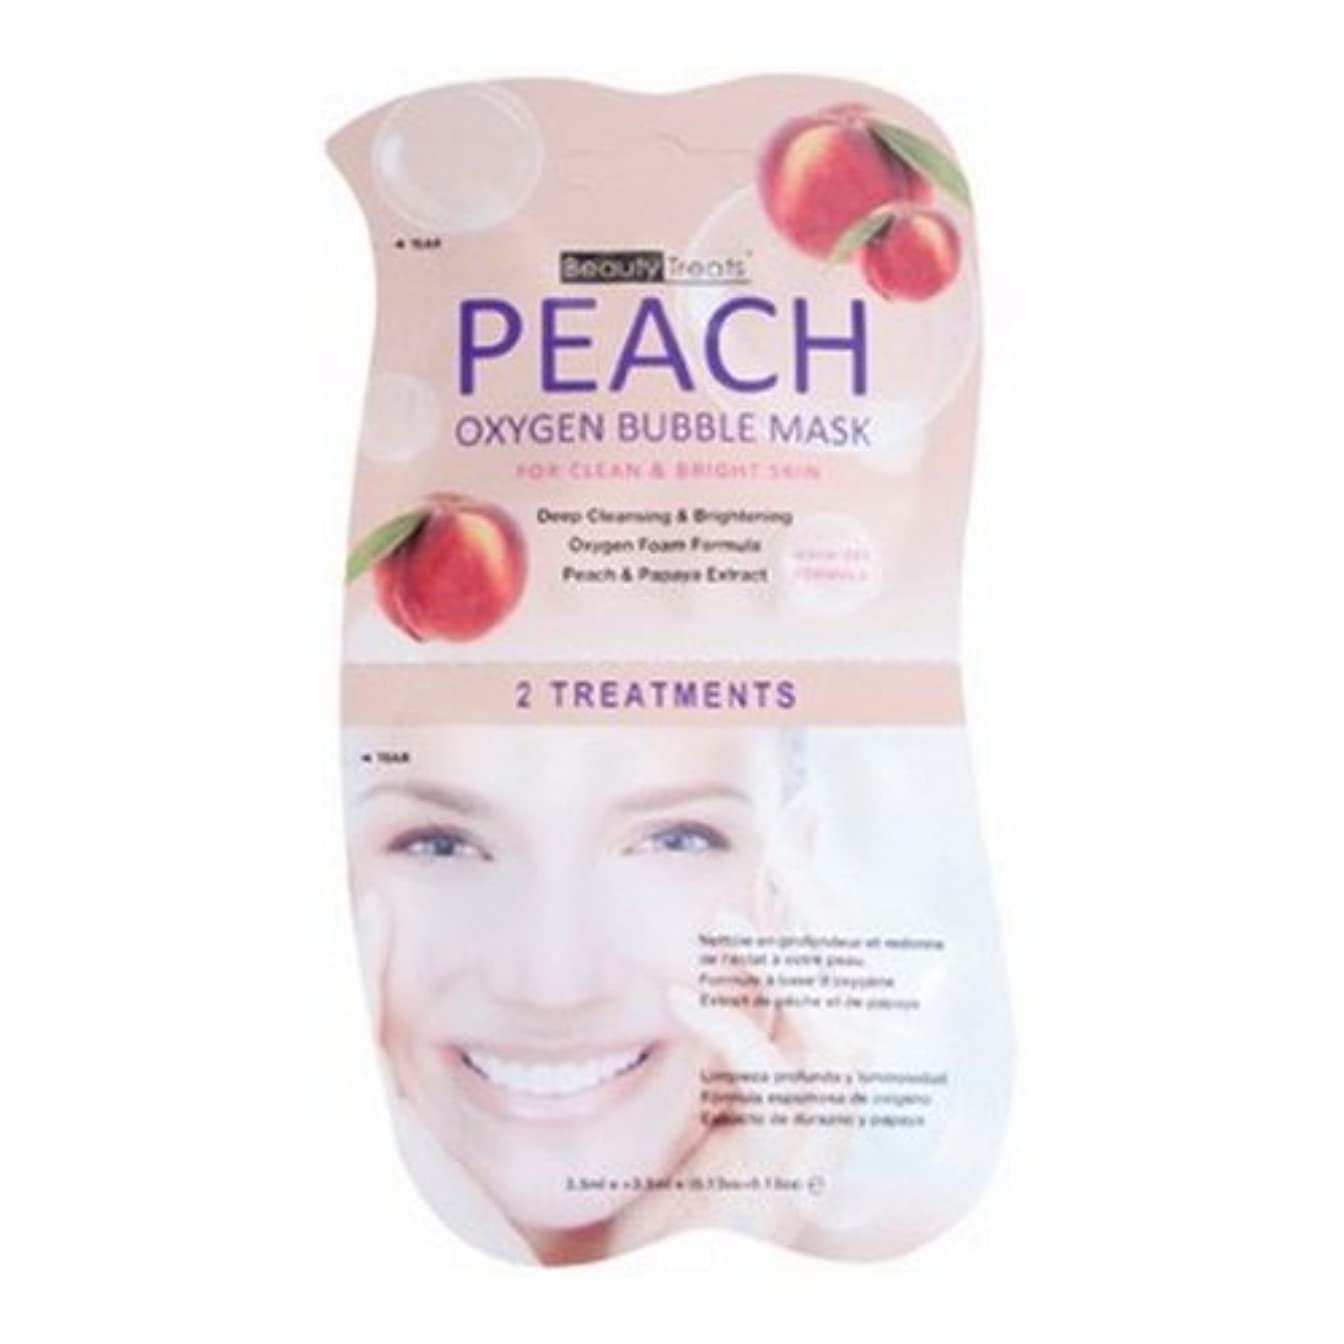 求人引き渡す一時停止(3 Pack) BEAUTY TREATS Peach Oxygen Bubble Mask - Peach (並行輸入品)